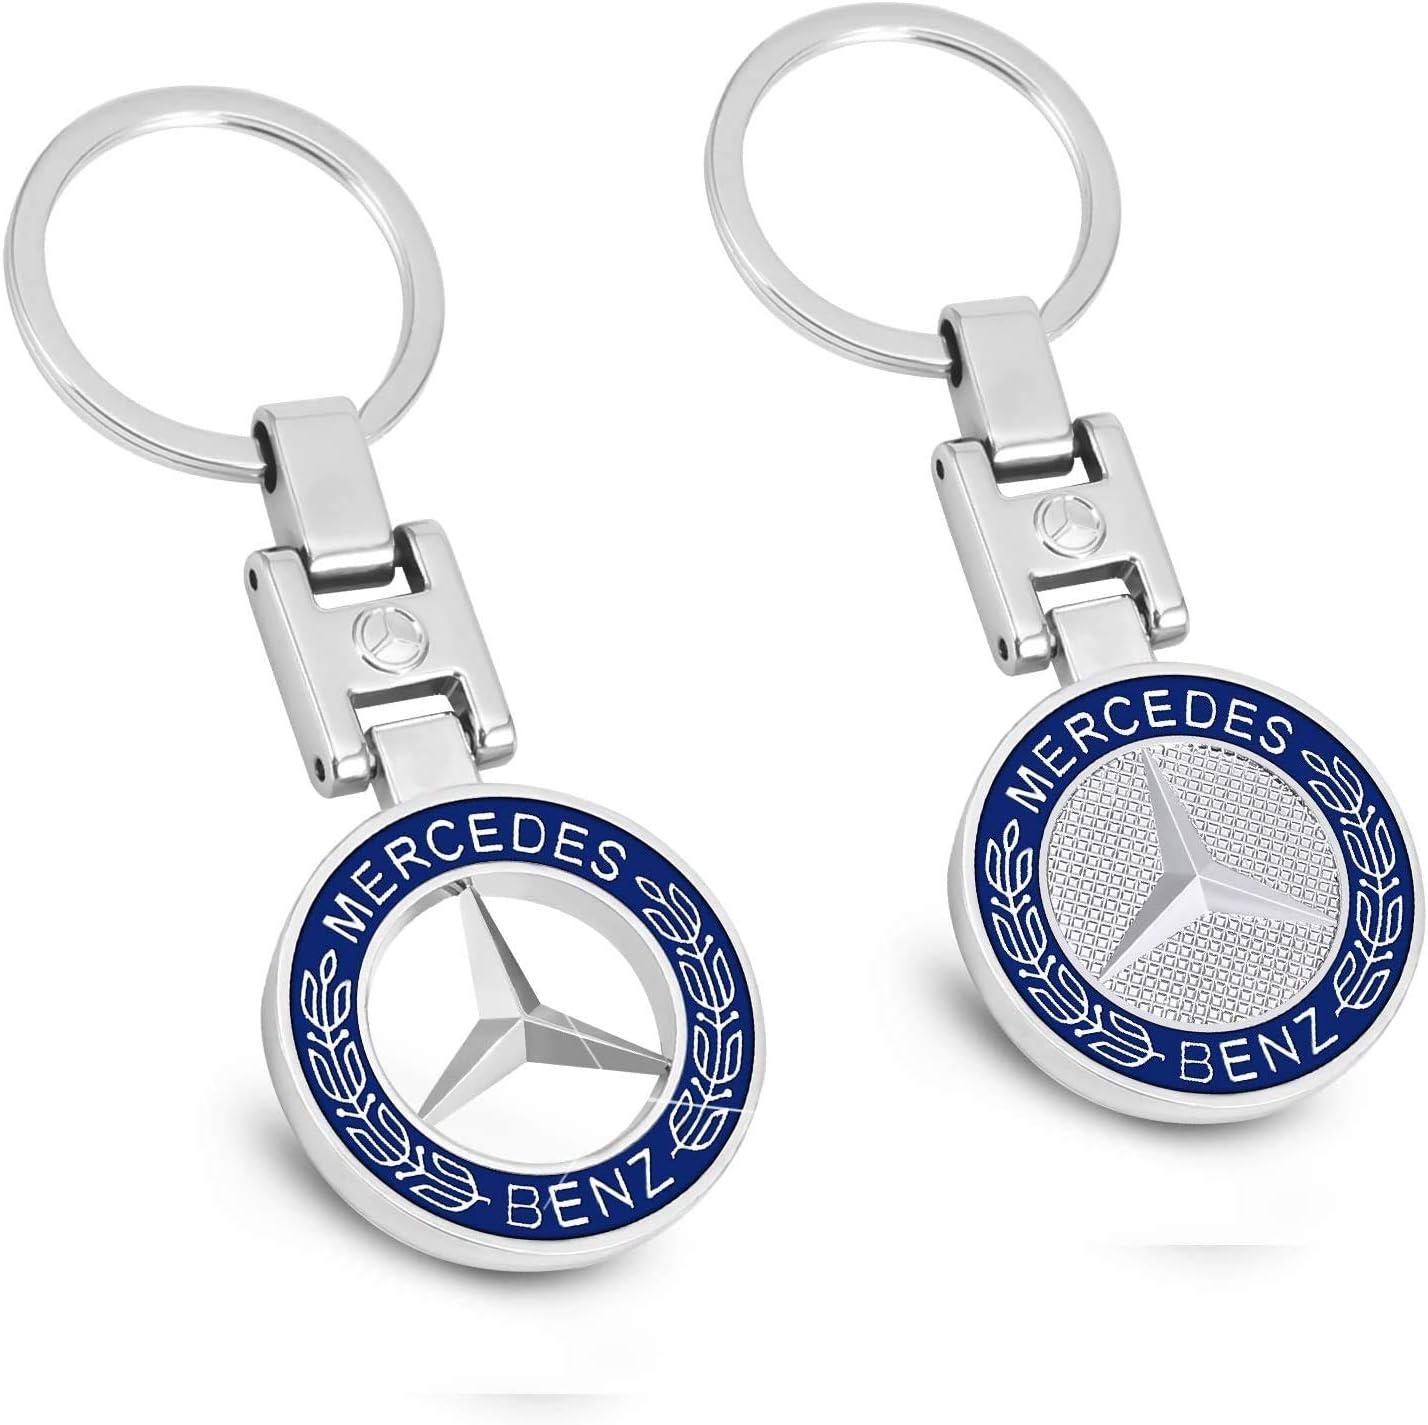 Fitracker 2 Neue 3d Auto Logo Schlüsselanhänger Metall Emblem Anhänger Schlüssel Halterung Auto